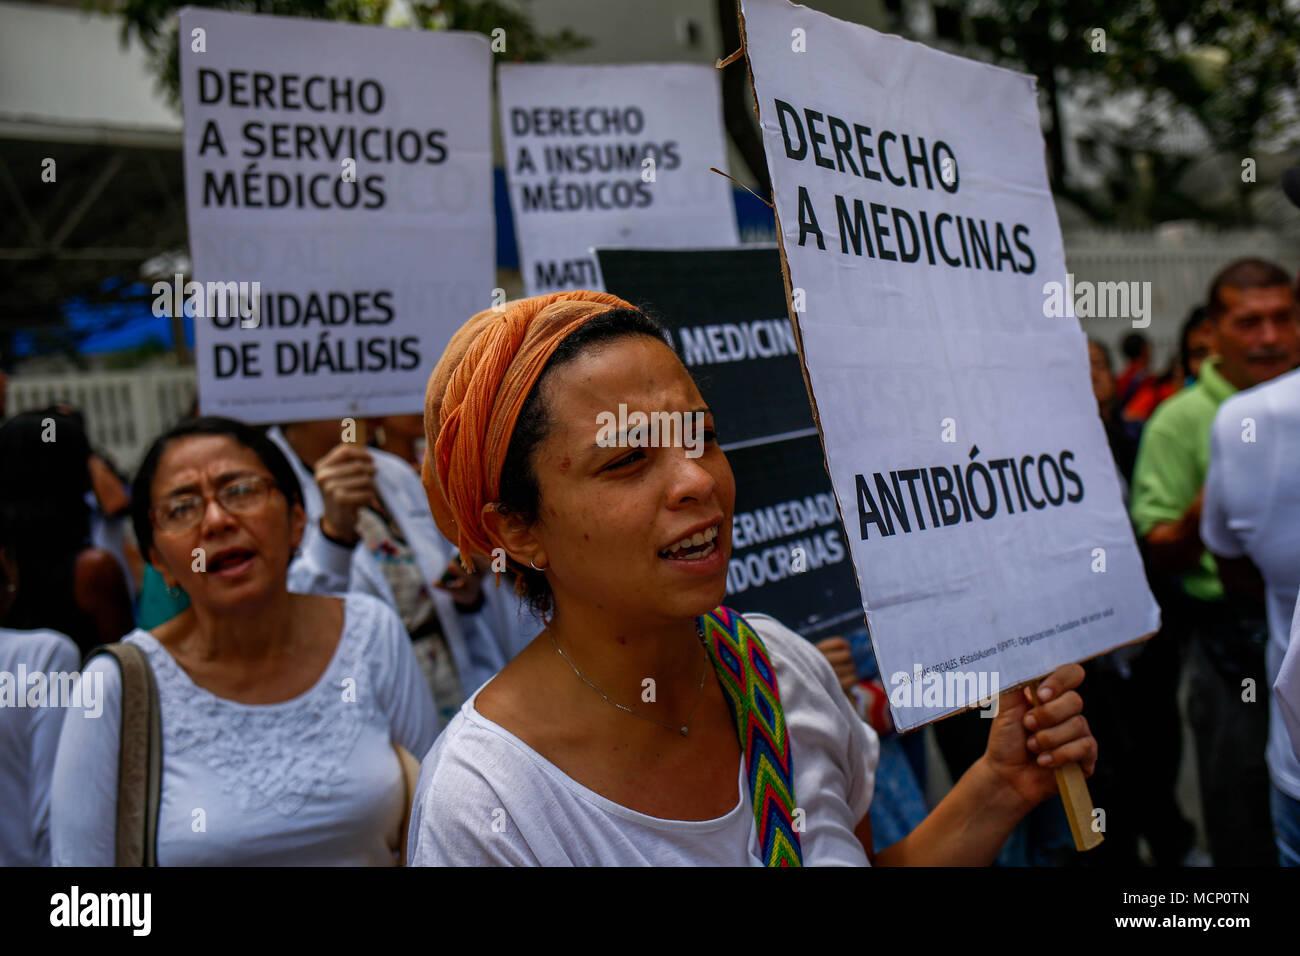 Caracas Venezuela 17th Apr 2018 Hospital Workers And Patients